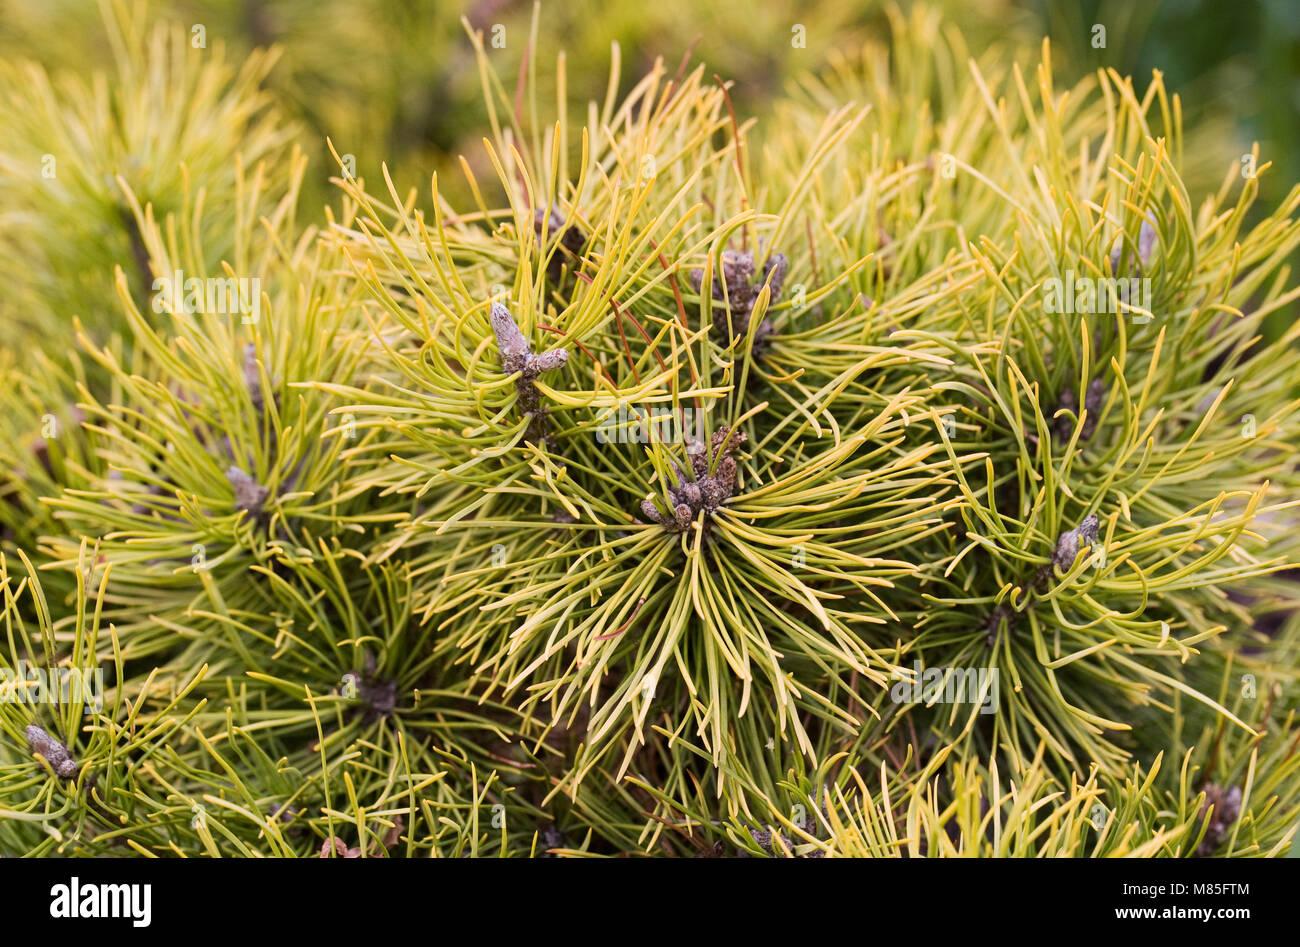 Pinus mugo 'Winter Gold' in March. - Stock Image